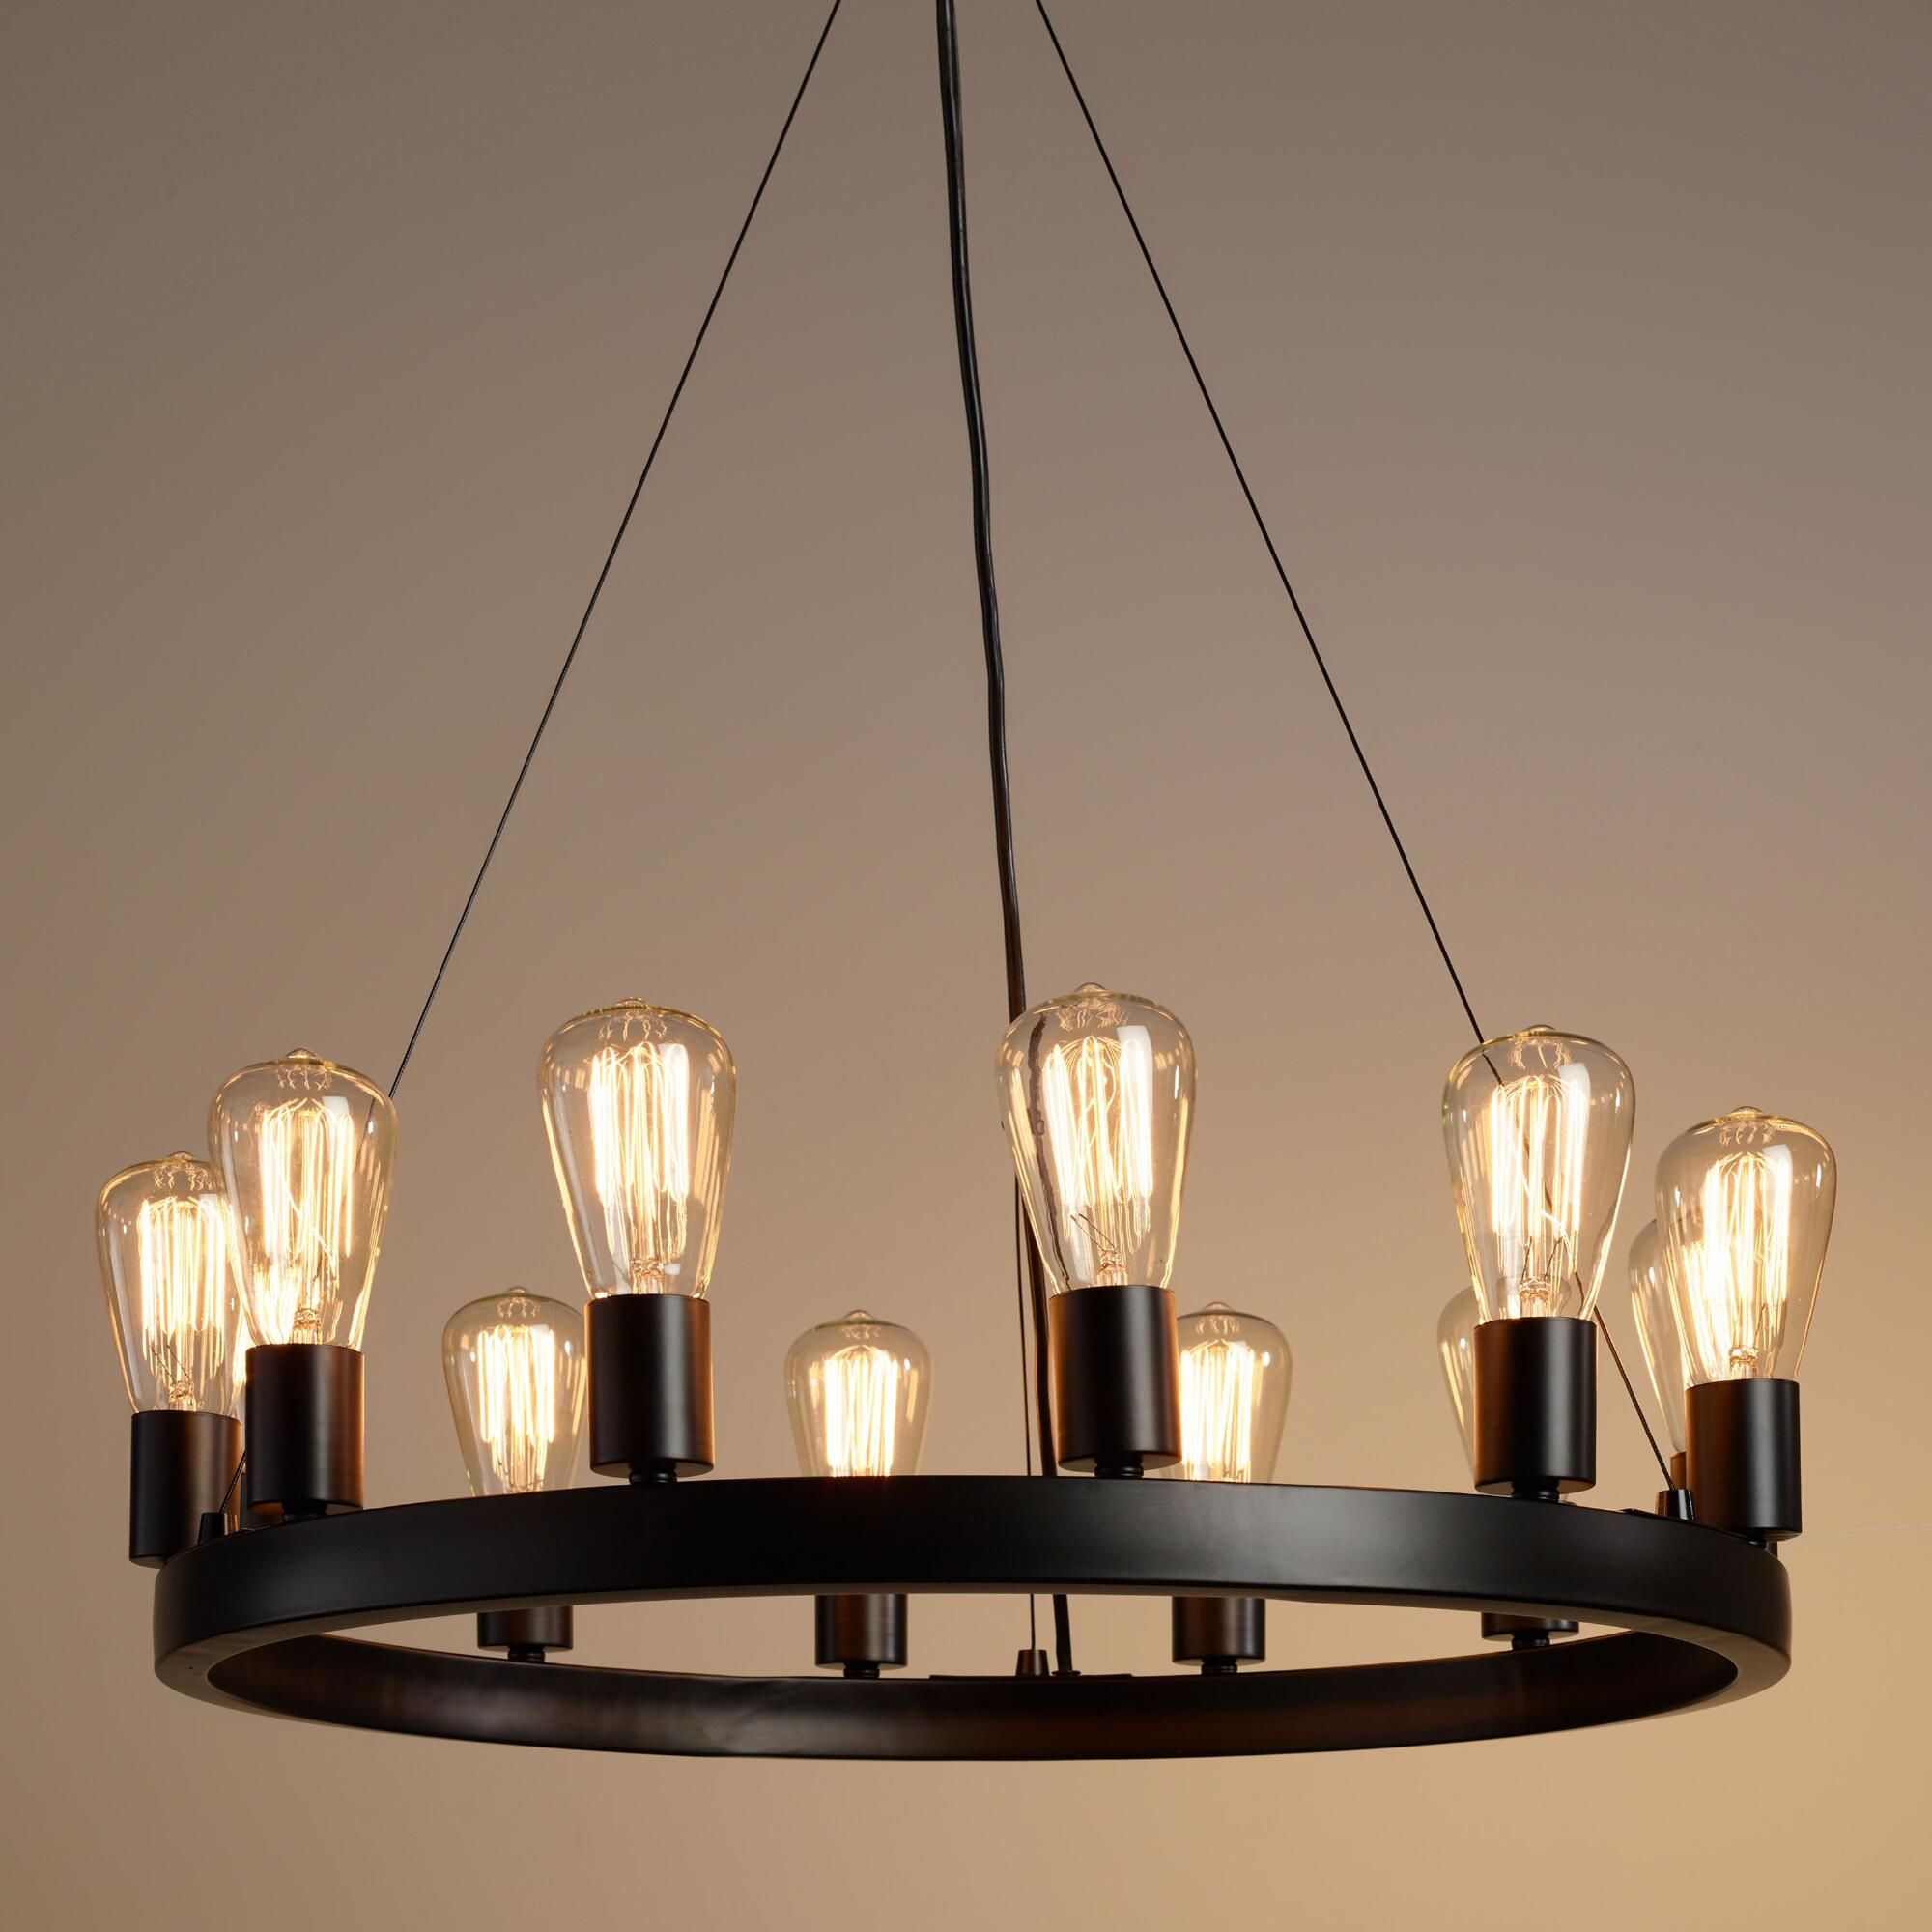 Round 12 Light Edison Bulb Chandelier Farmhouse Light Fixtures